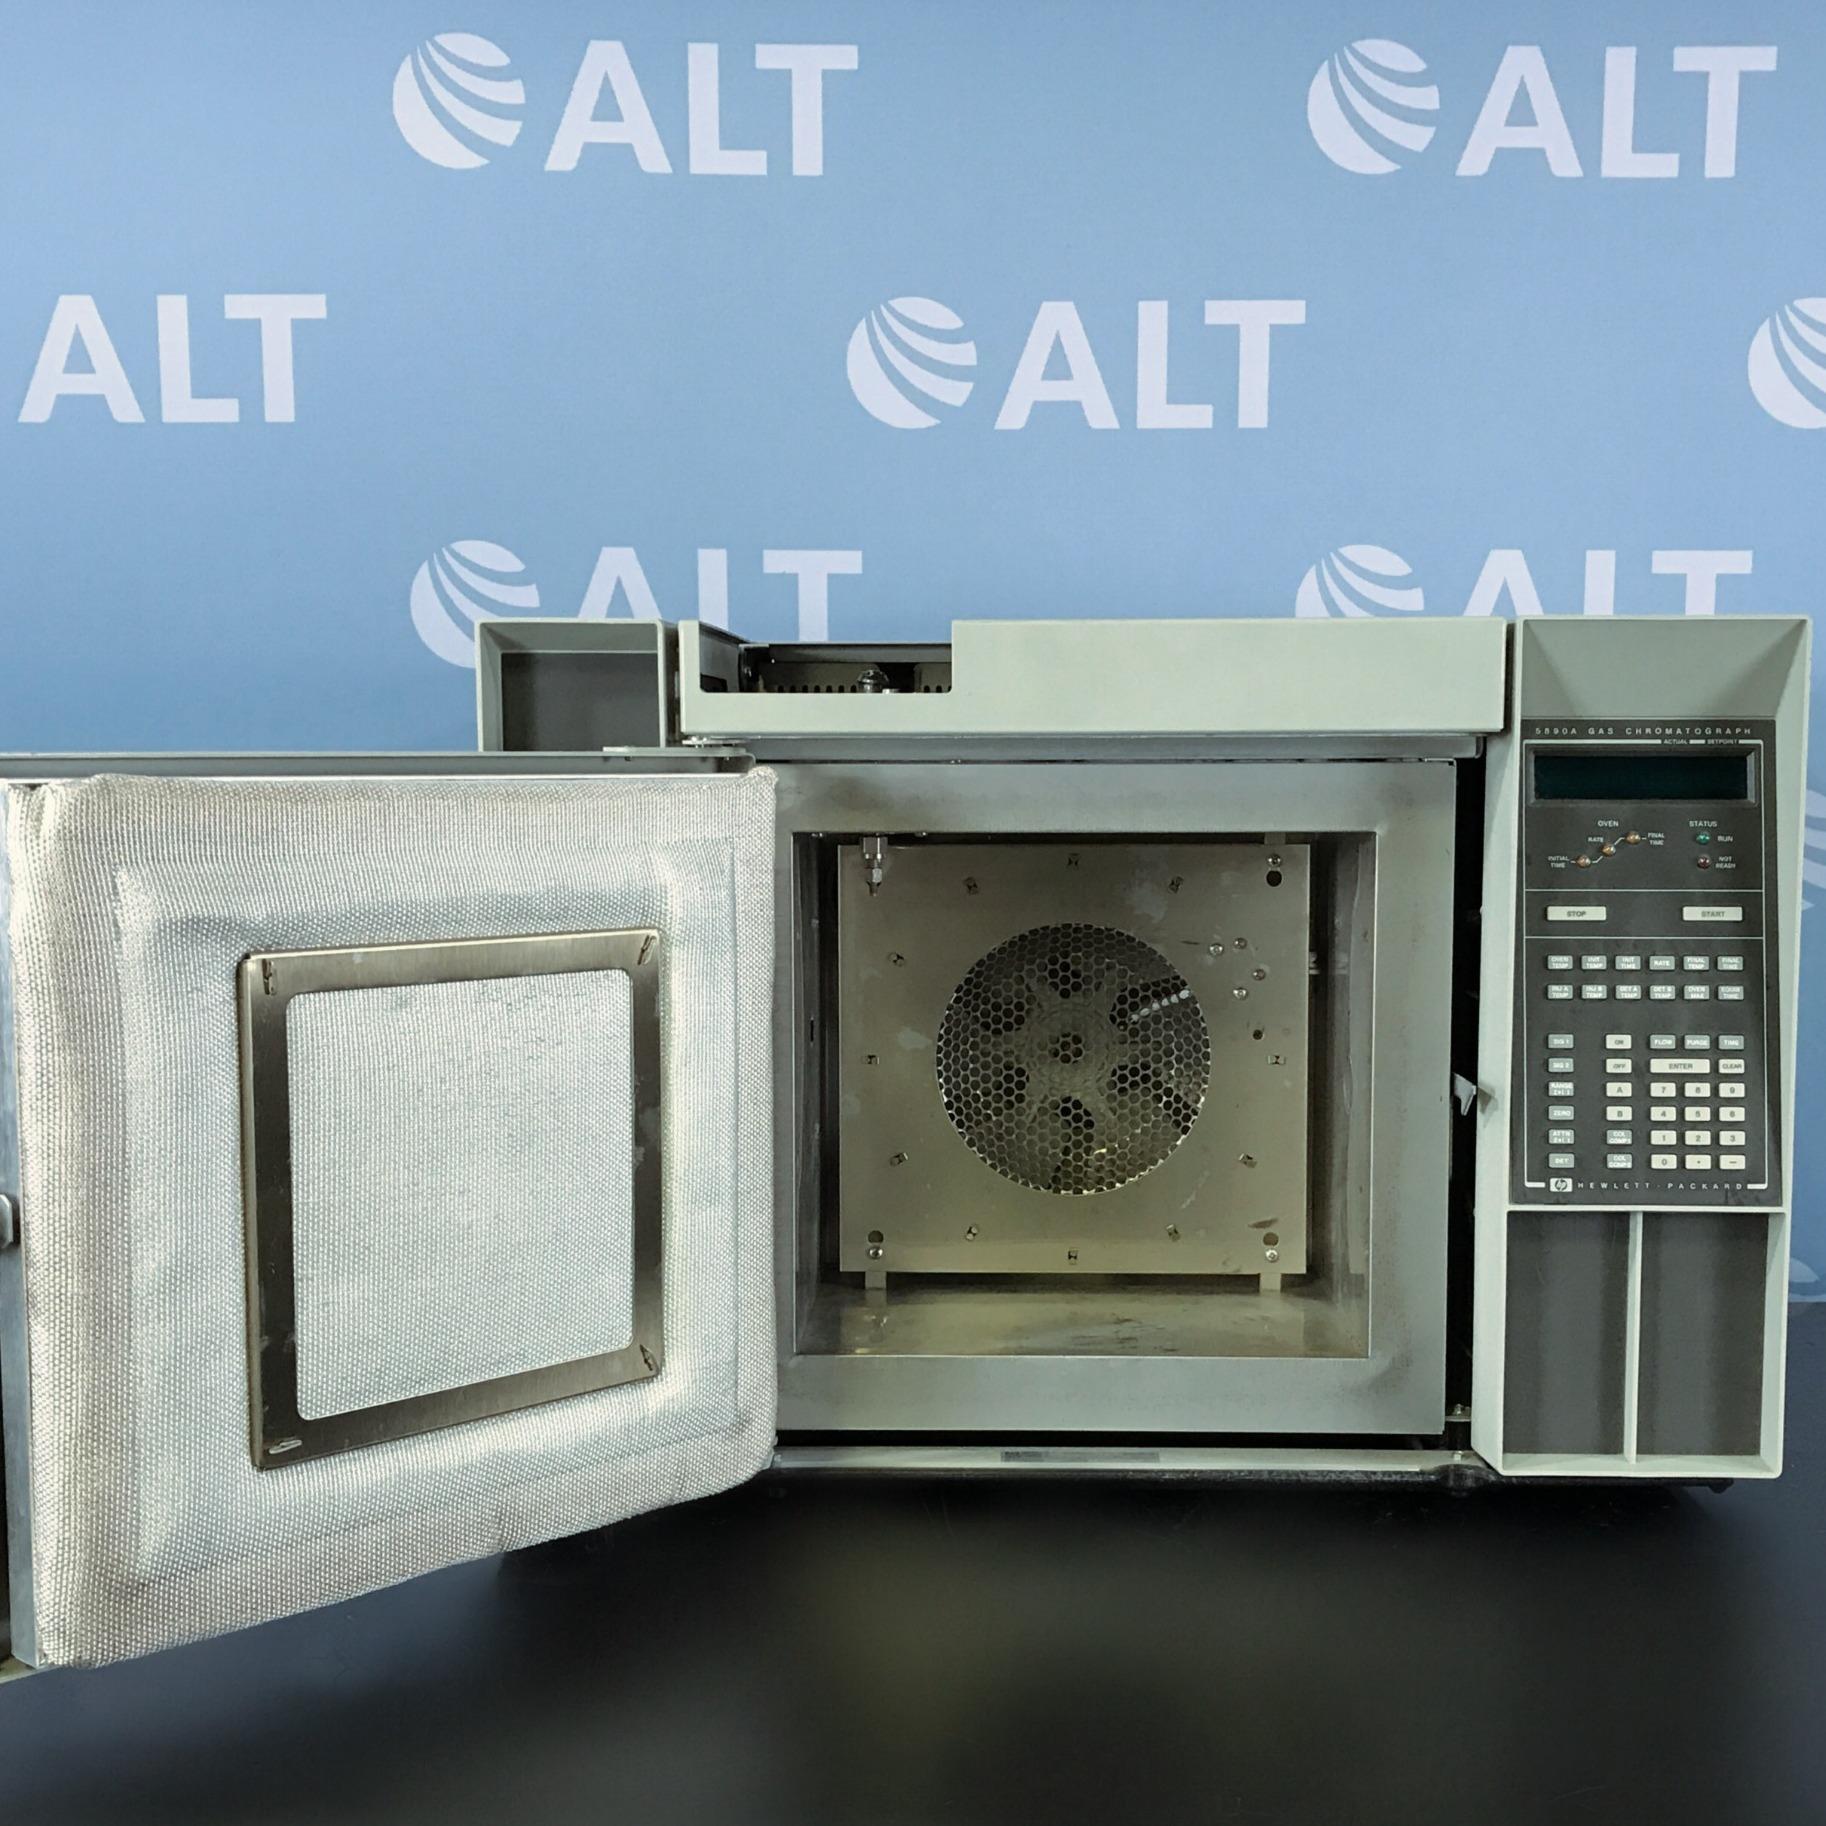 Hewlett Packard HP 5890A Gas Chromatograph System Image